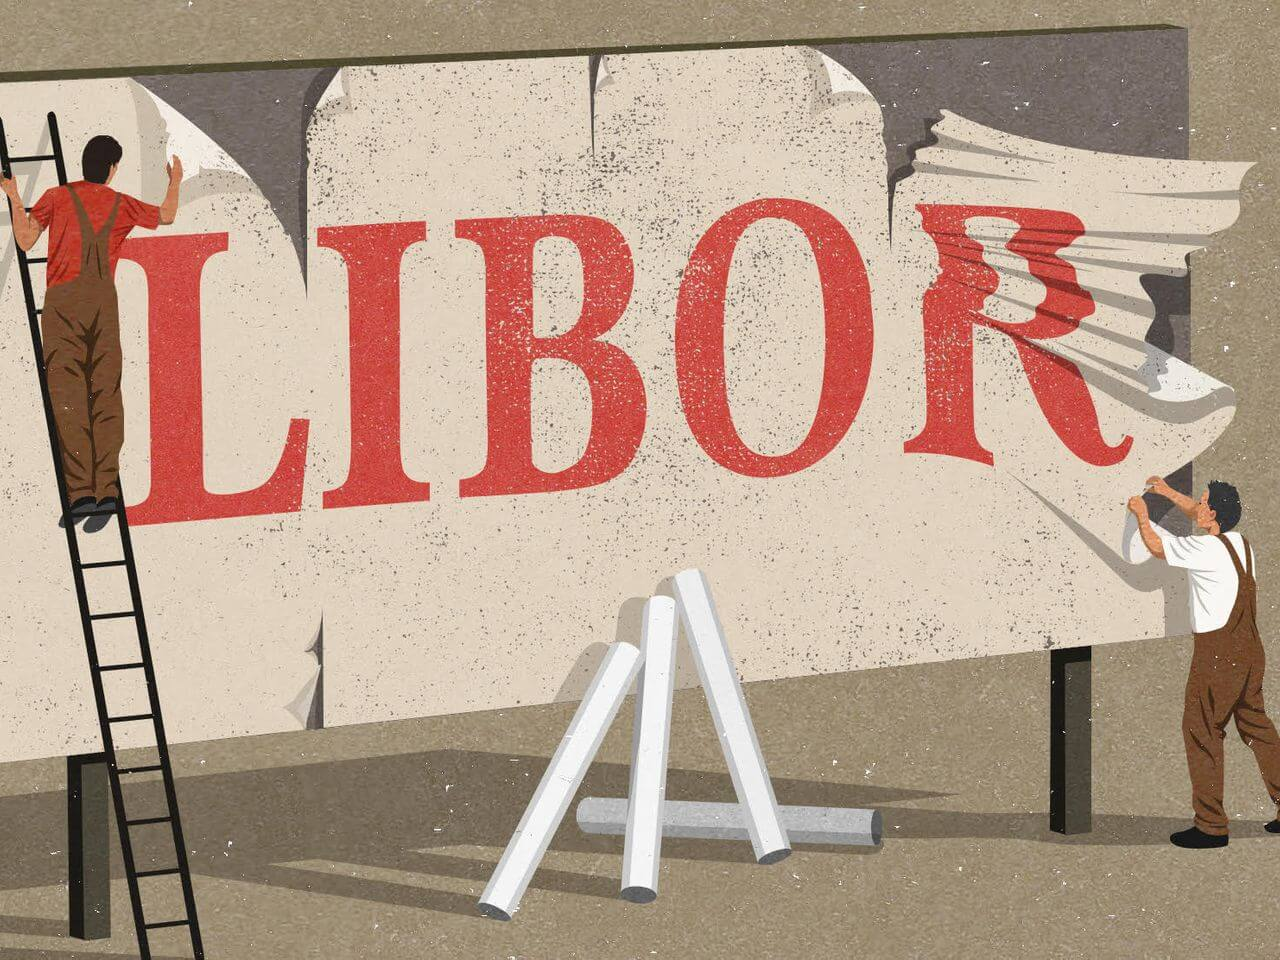 Libor-going-down